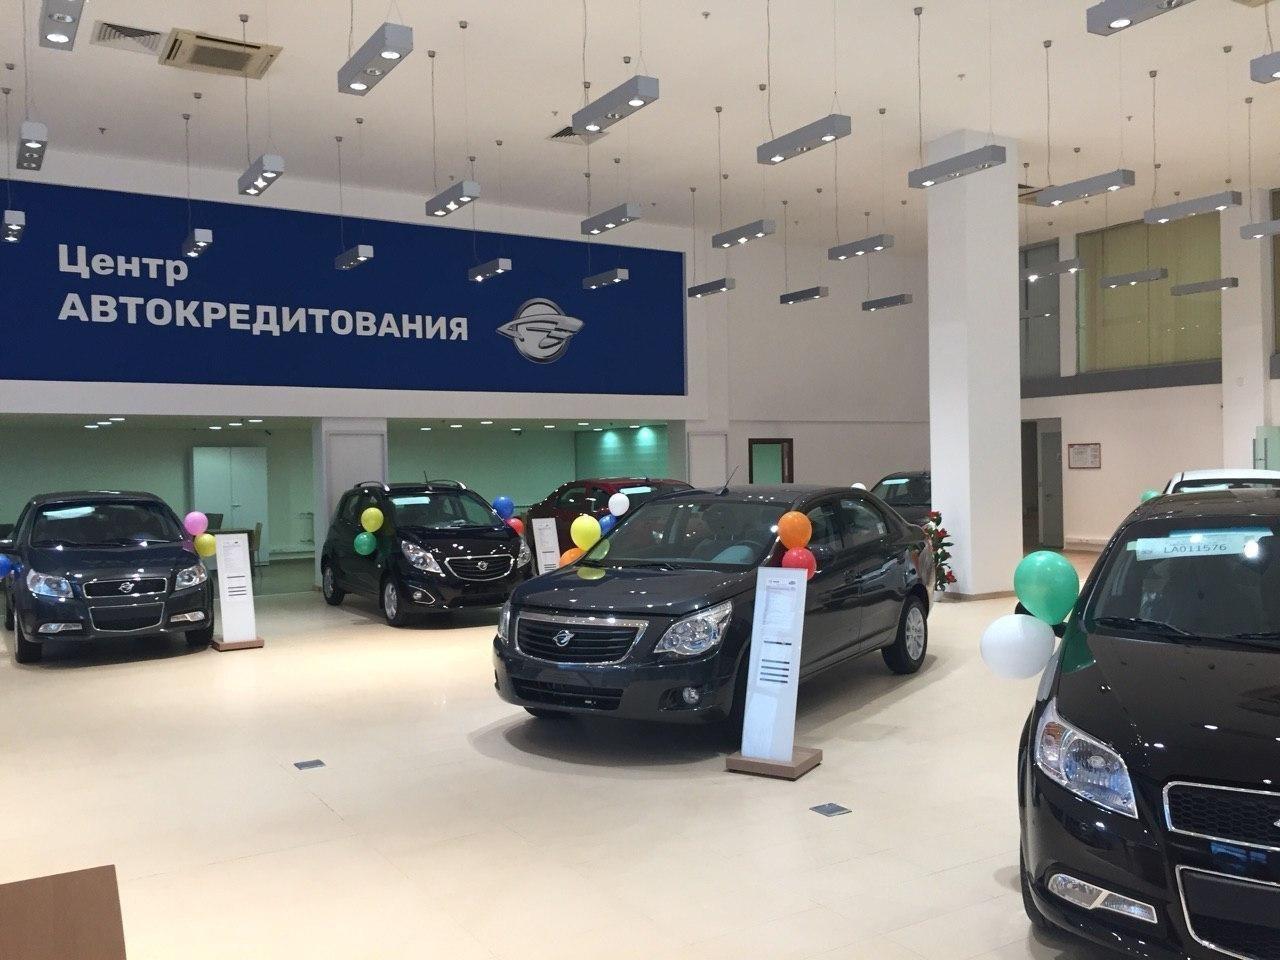 Автосалон эксклюзив авто москве митсубиси паджеро цена в автосалоне москвы